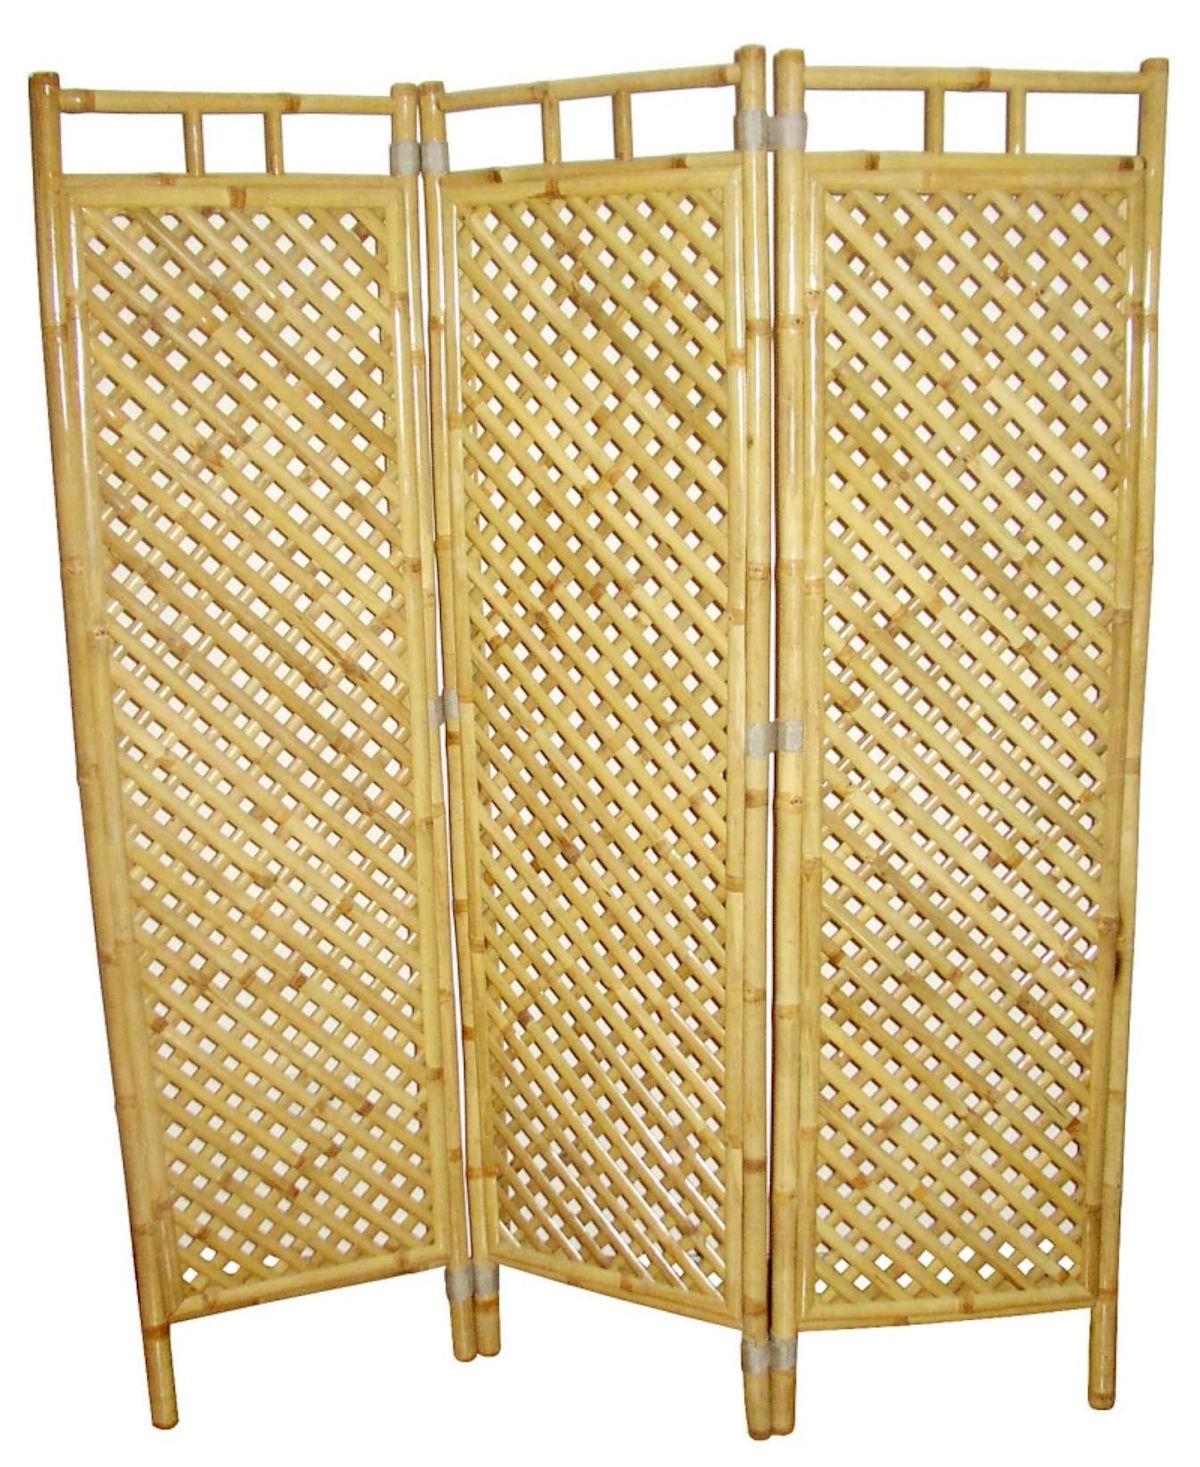 Full Size of Bambus Paravent Raumteile 3 45 Cm H 160 Garten Bett Wohnzimmer Paravent Bambus